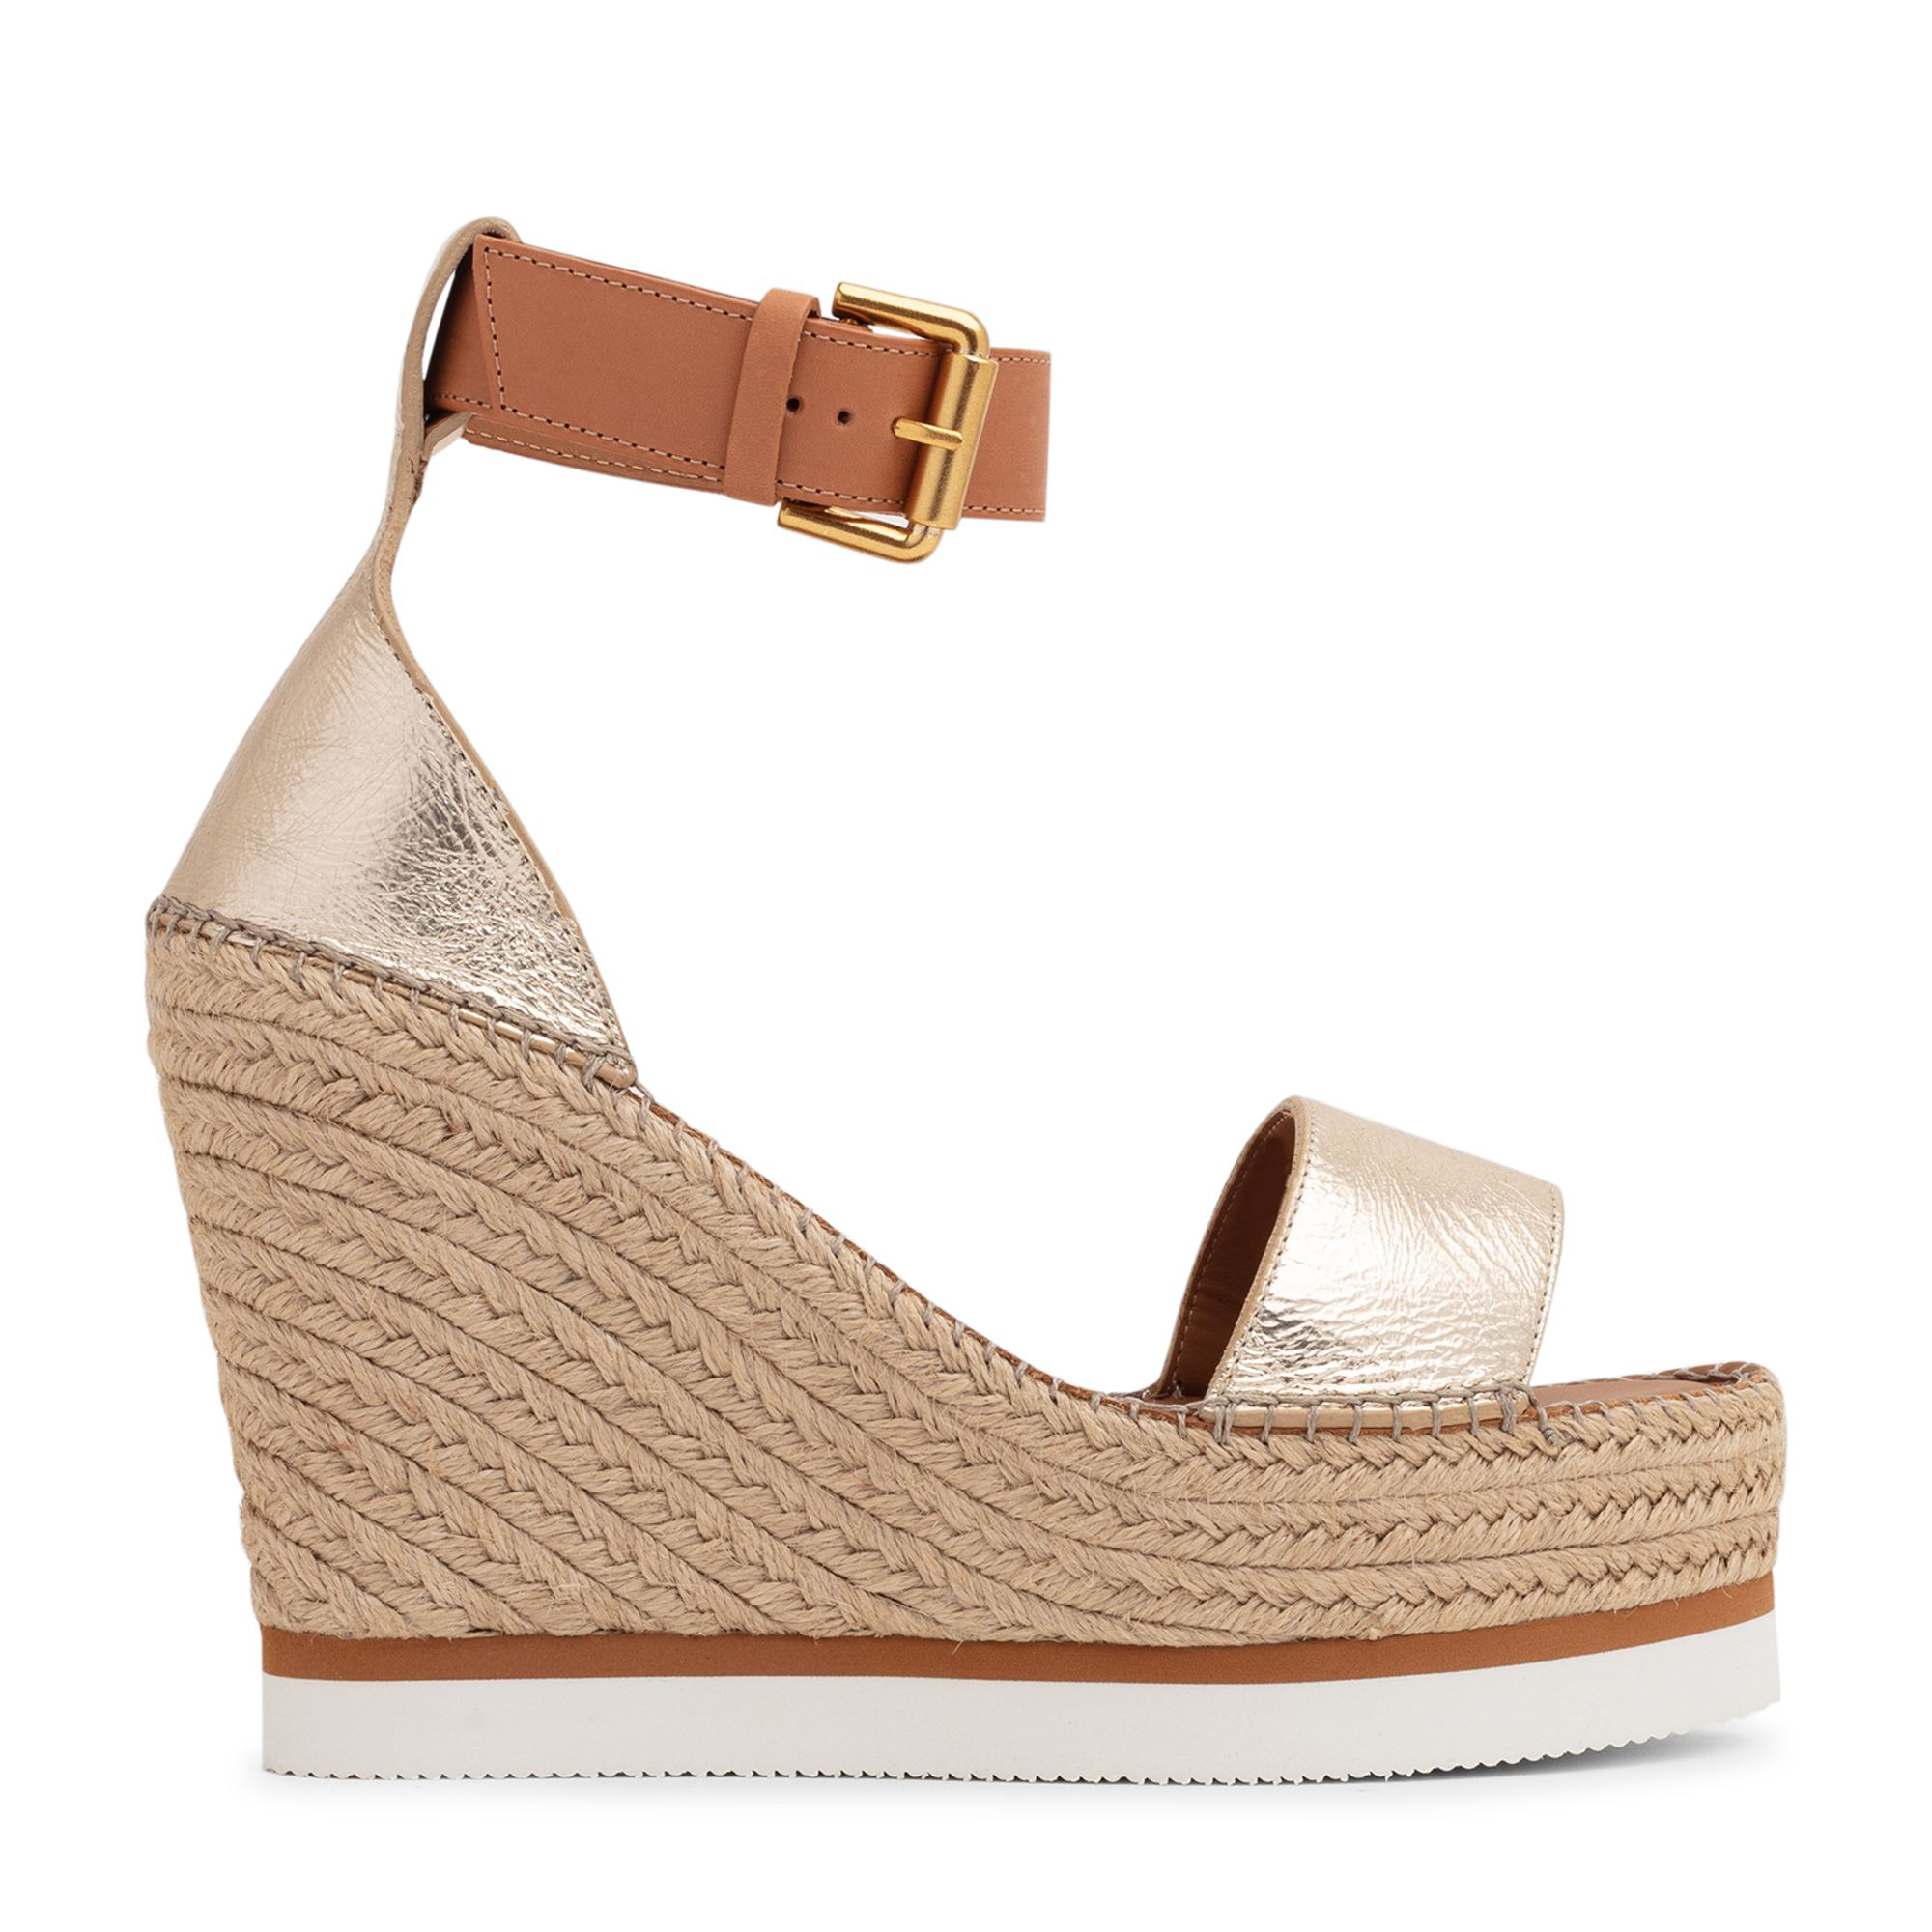 Glyn wedge espadrille sandals